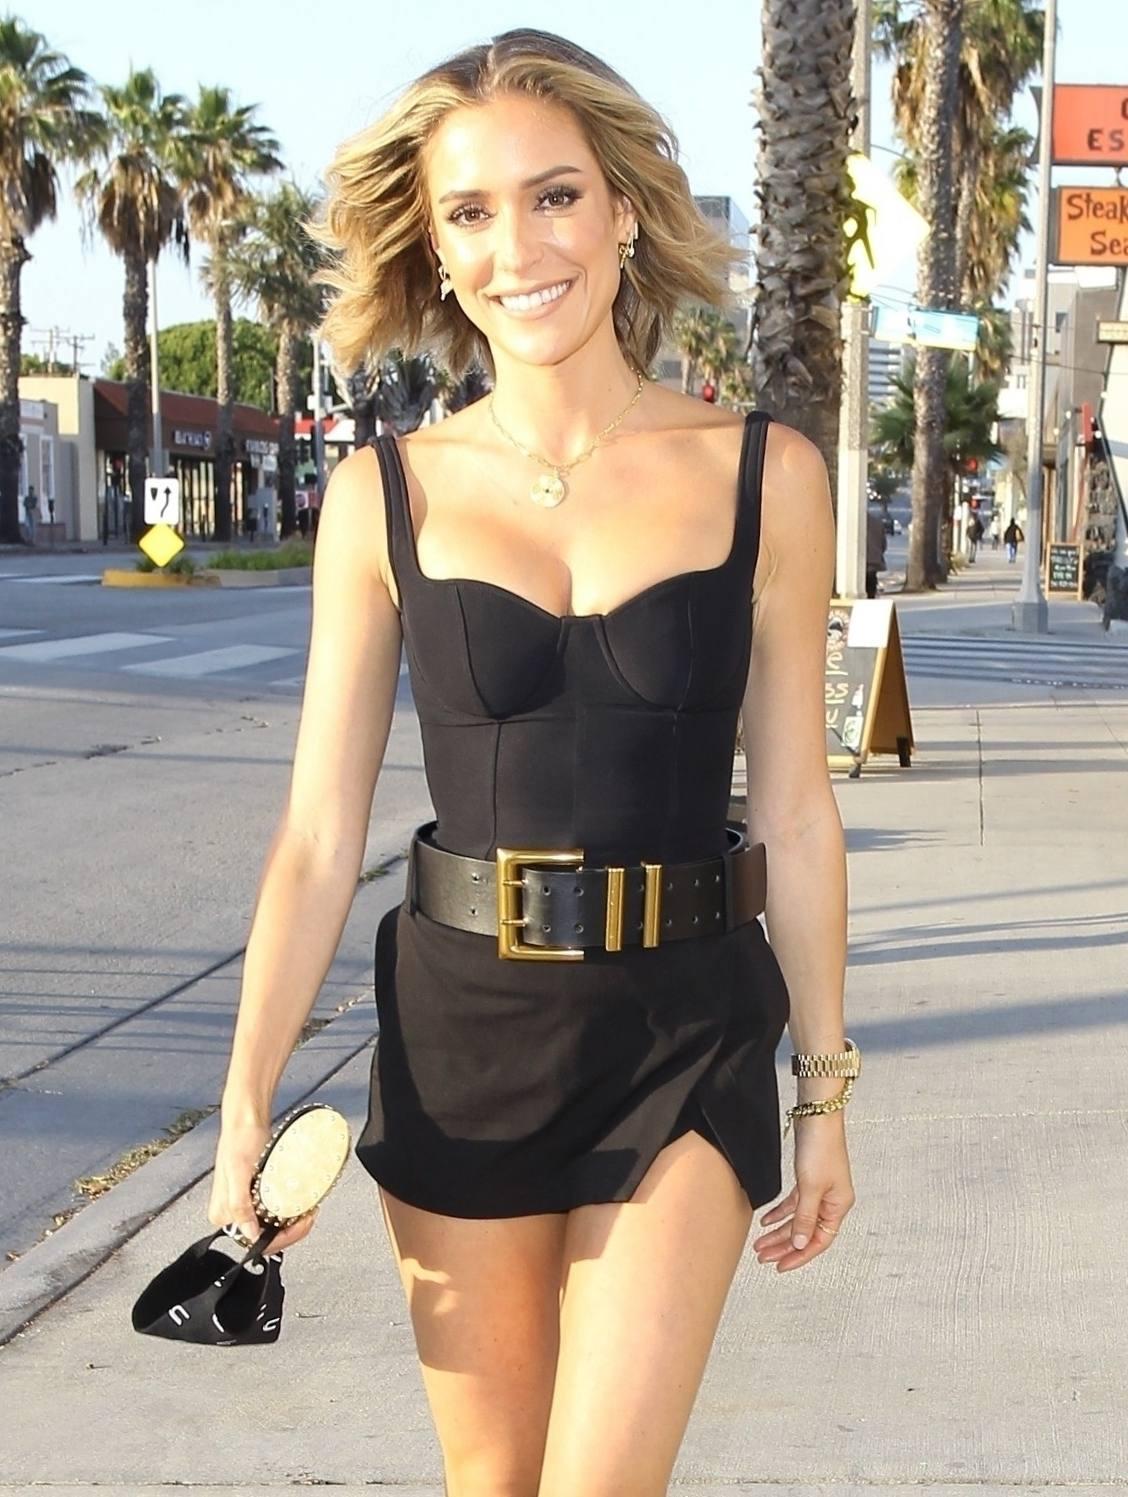 Kristin Cavallari – Sexy Legs And Beautiful Cleavage At Fia In Santa Monica 0003